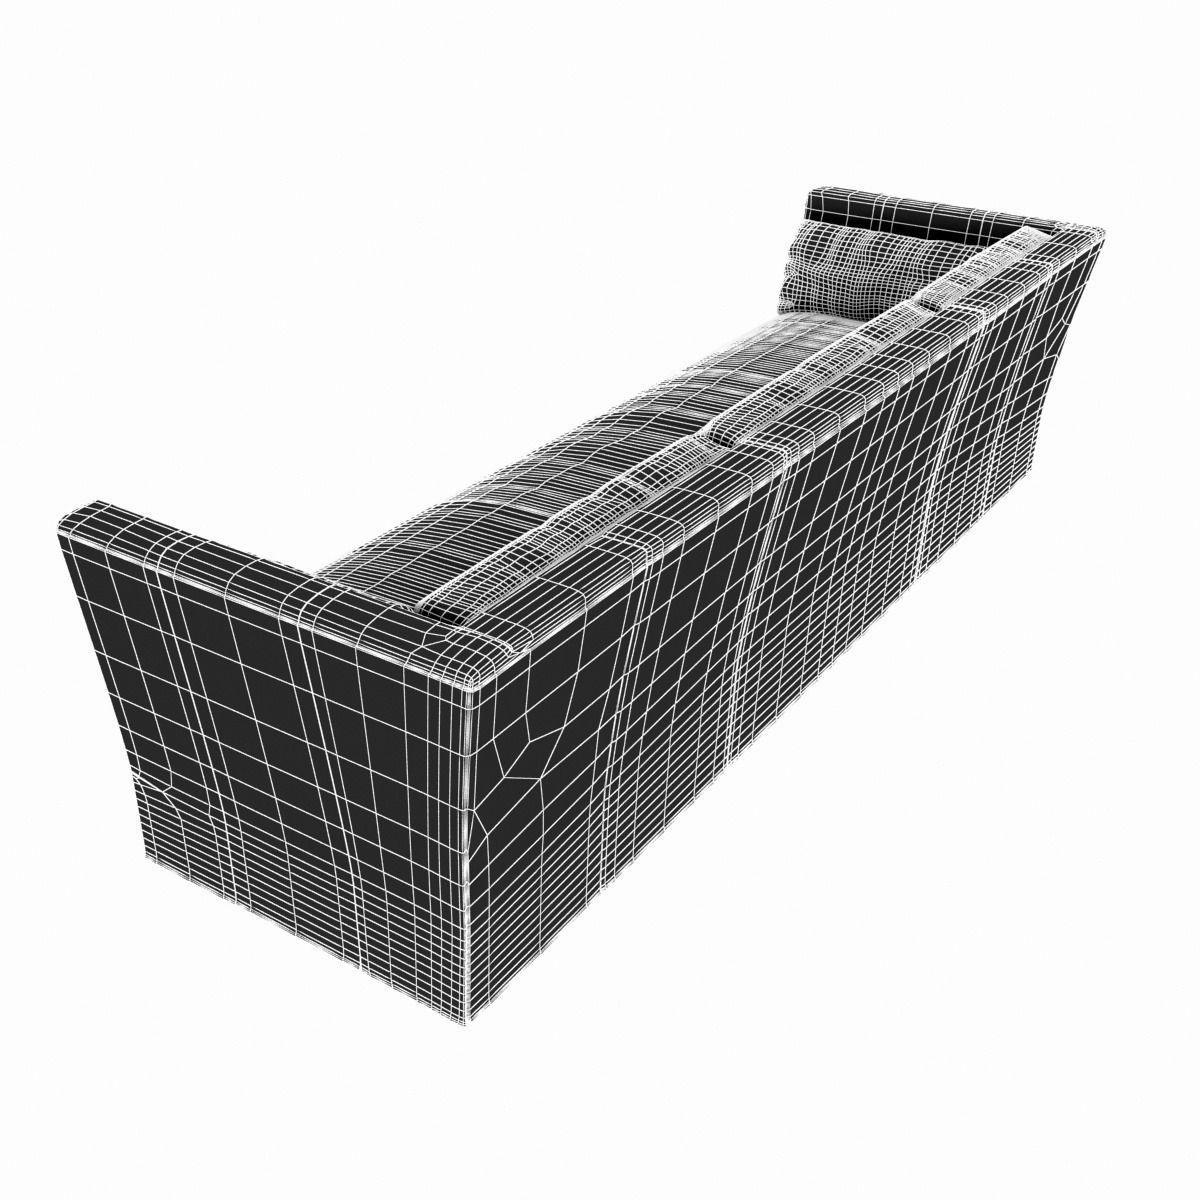 belgian shelter arm sofa sofascore barcelona vs atletico madrid restoration hardware leather 3d